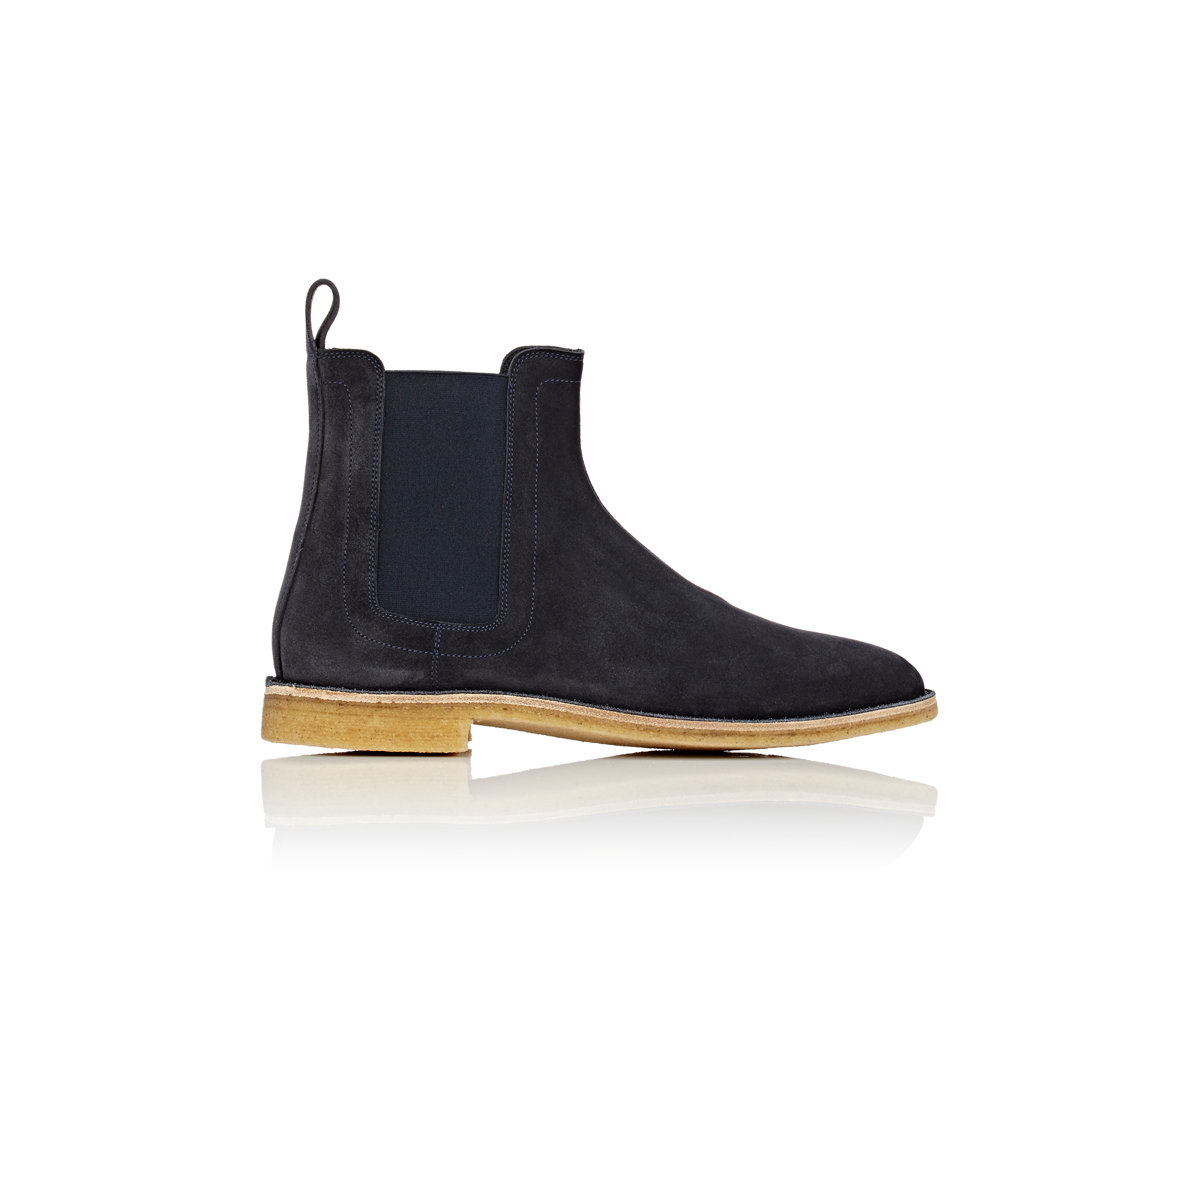 Model Bottega Veneta Aussie Suede Chelsea Boots In Gray For Men  Lyst